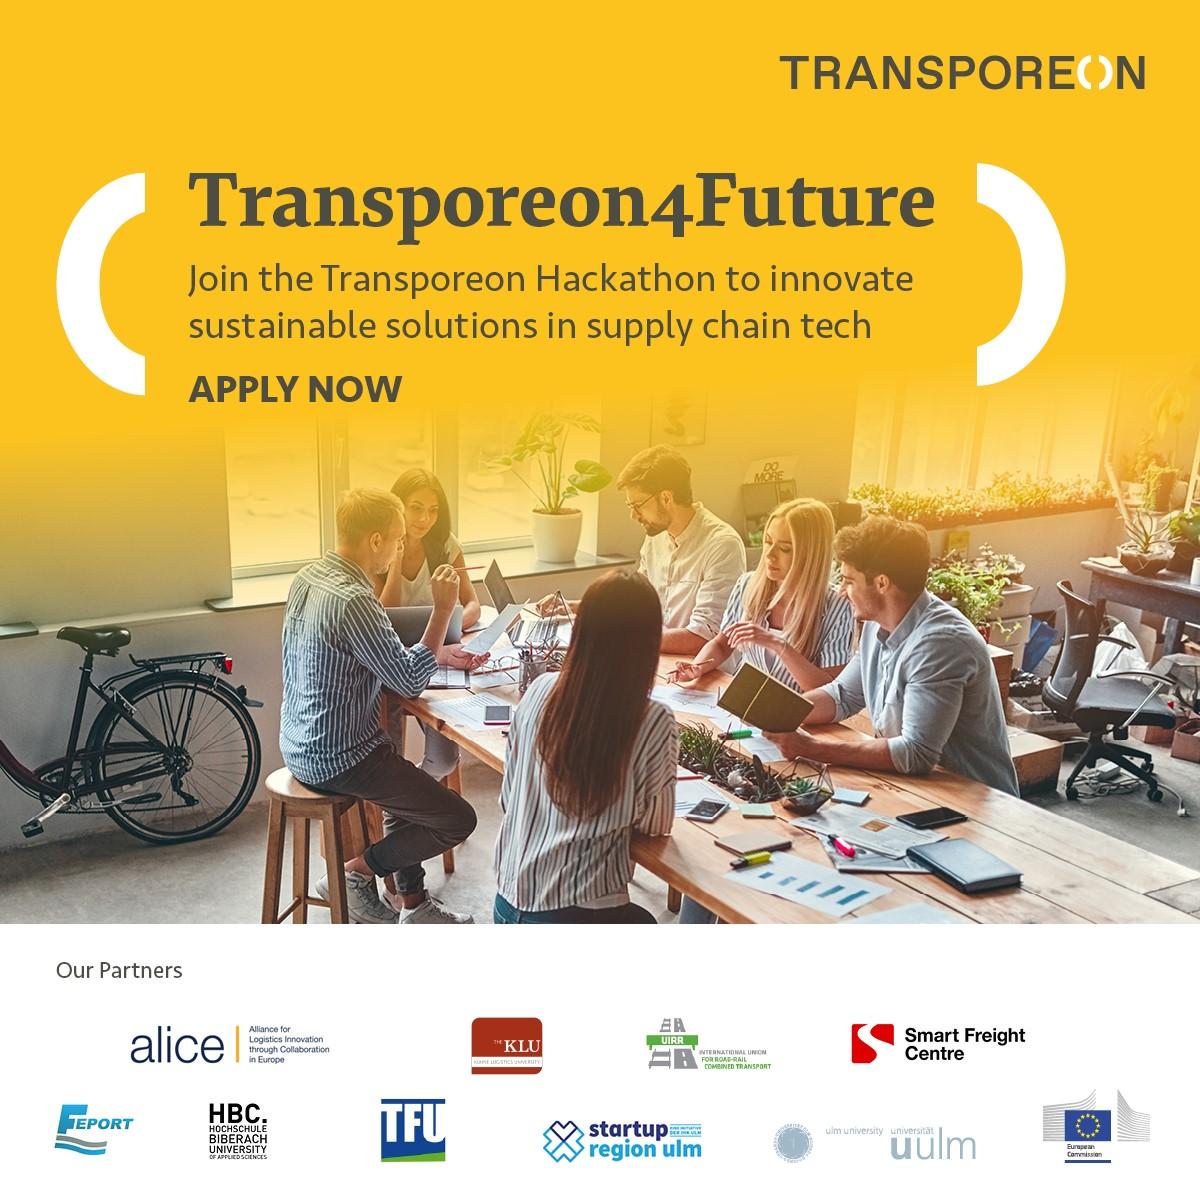 Transporeon 4 Future